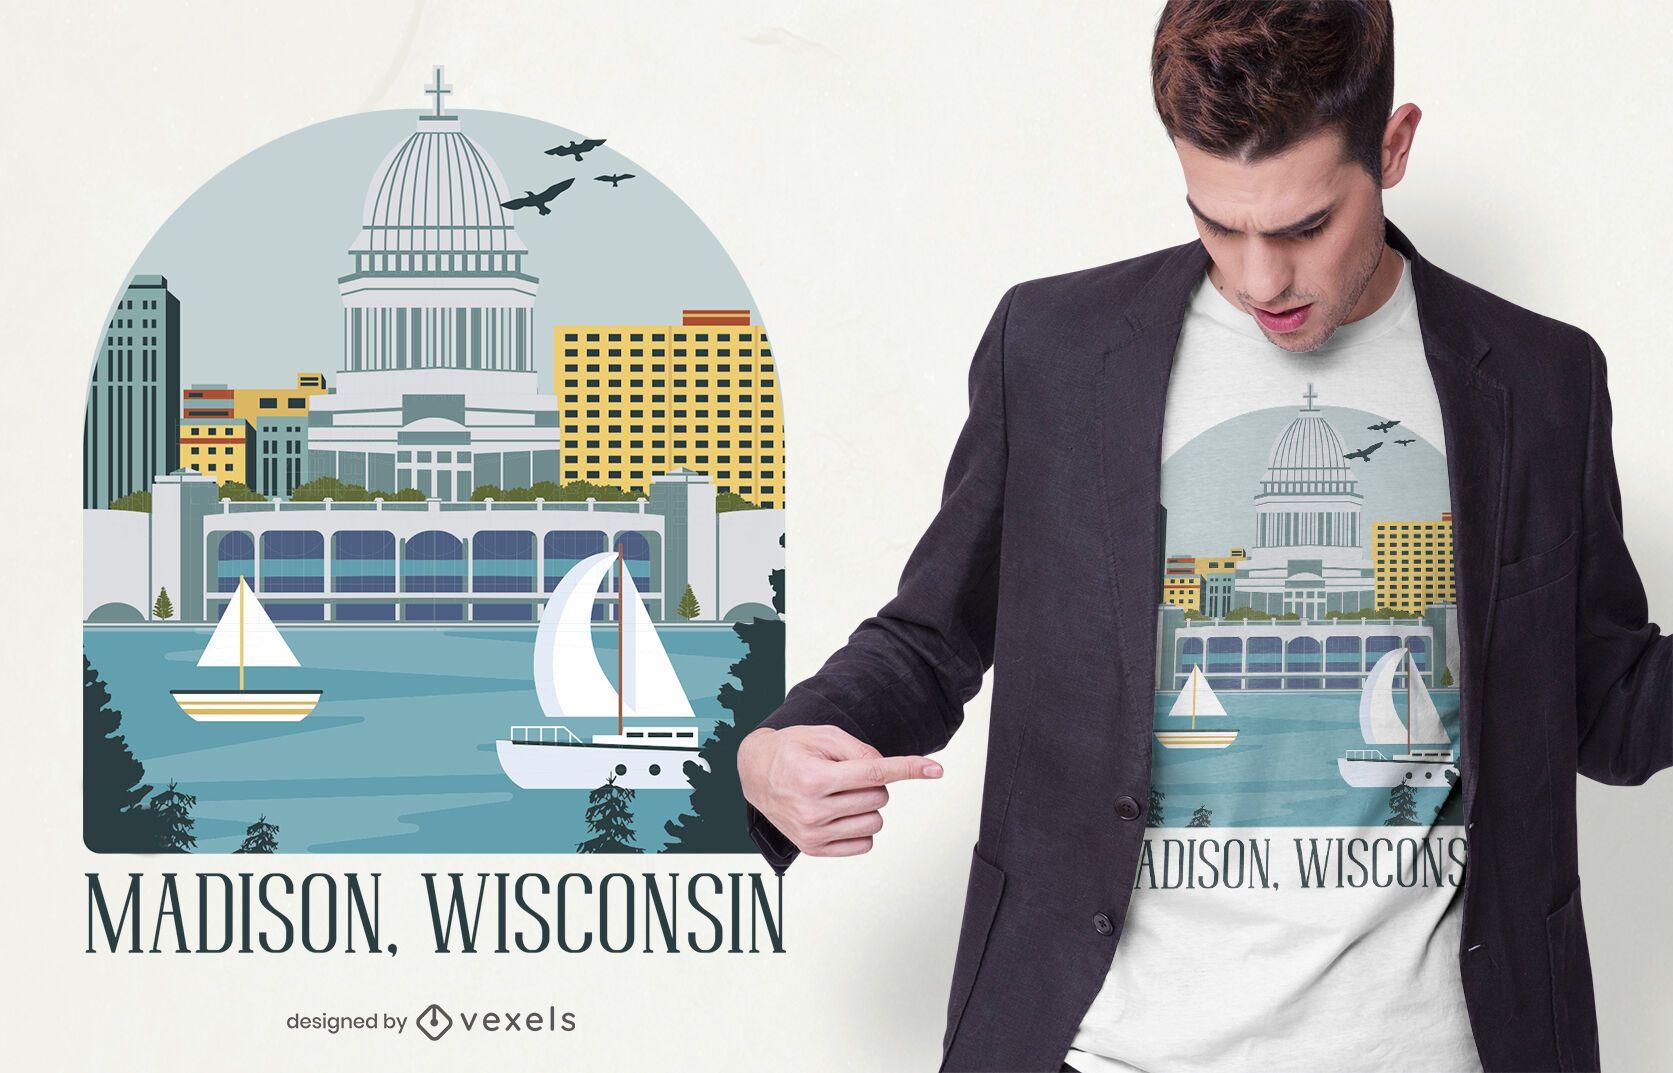 Madison wisconsin t-shirt design